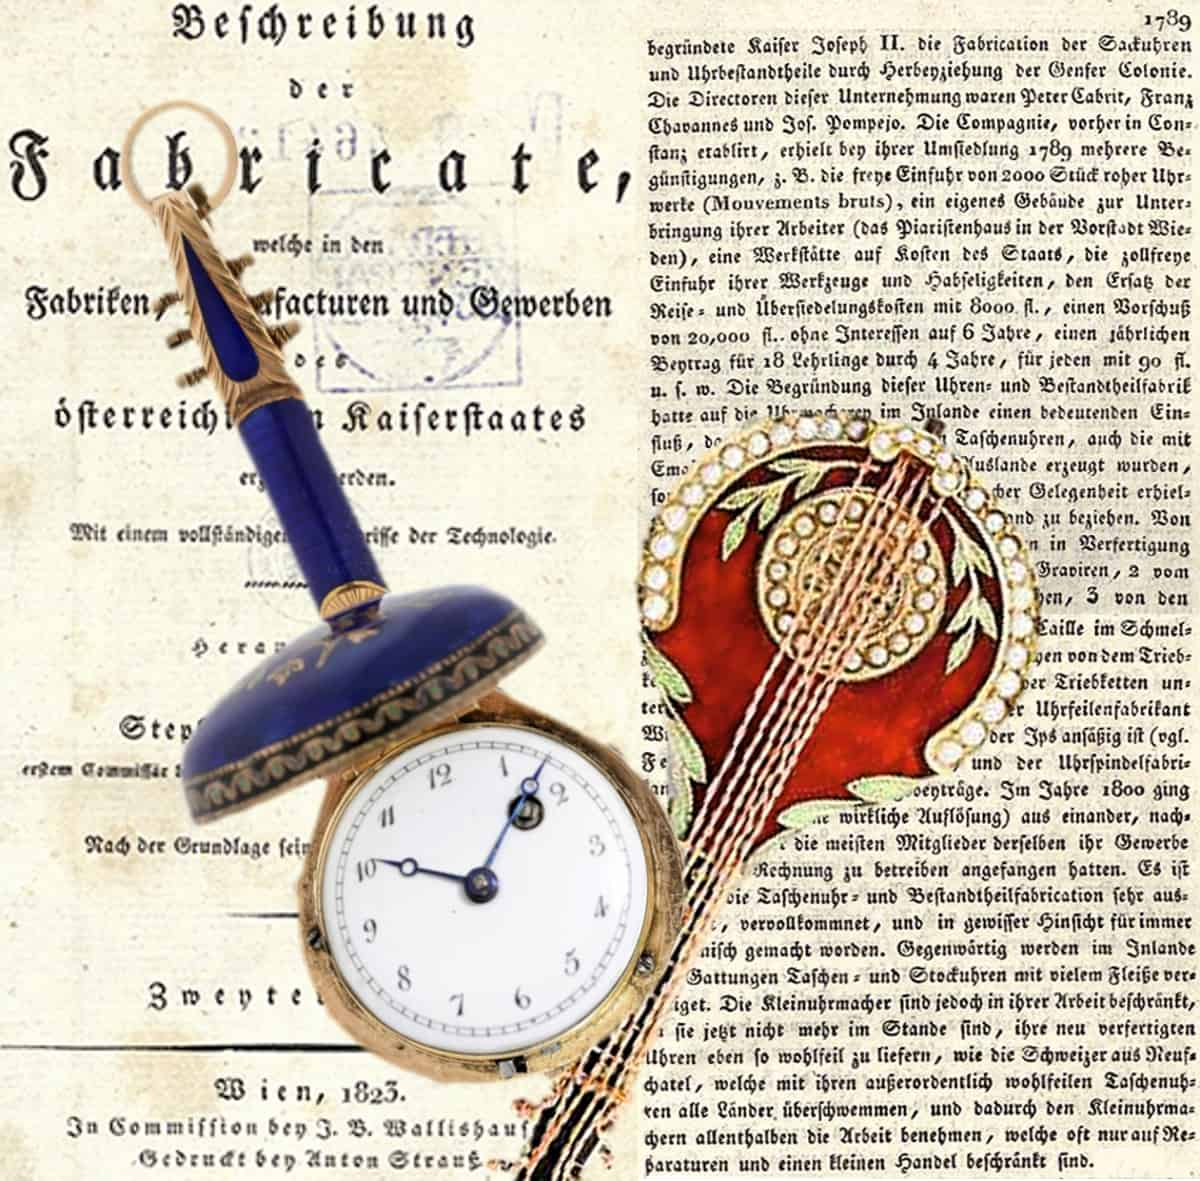 Franz Josef Pompejo Wien ca 1810 - Les Frères Raffard (C) Dr. Crott Auktionen